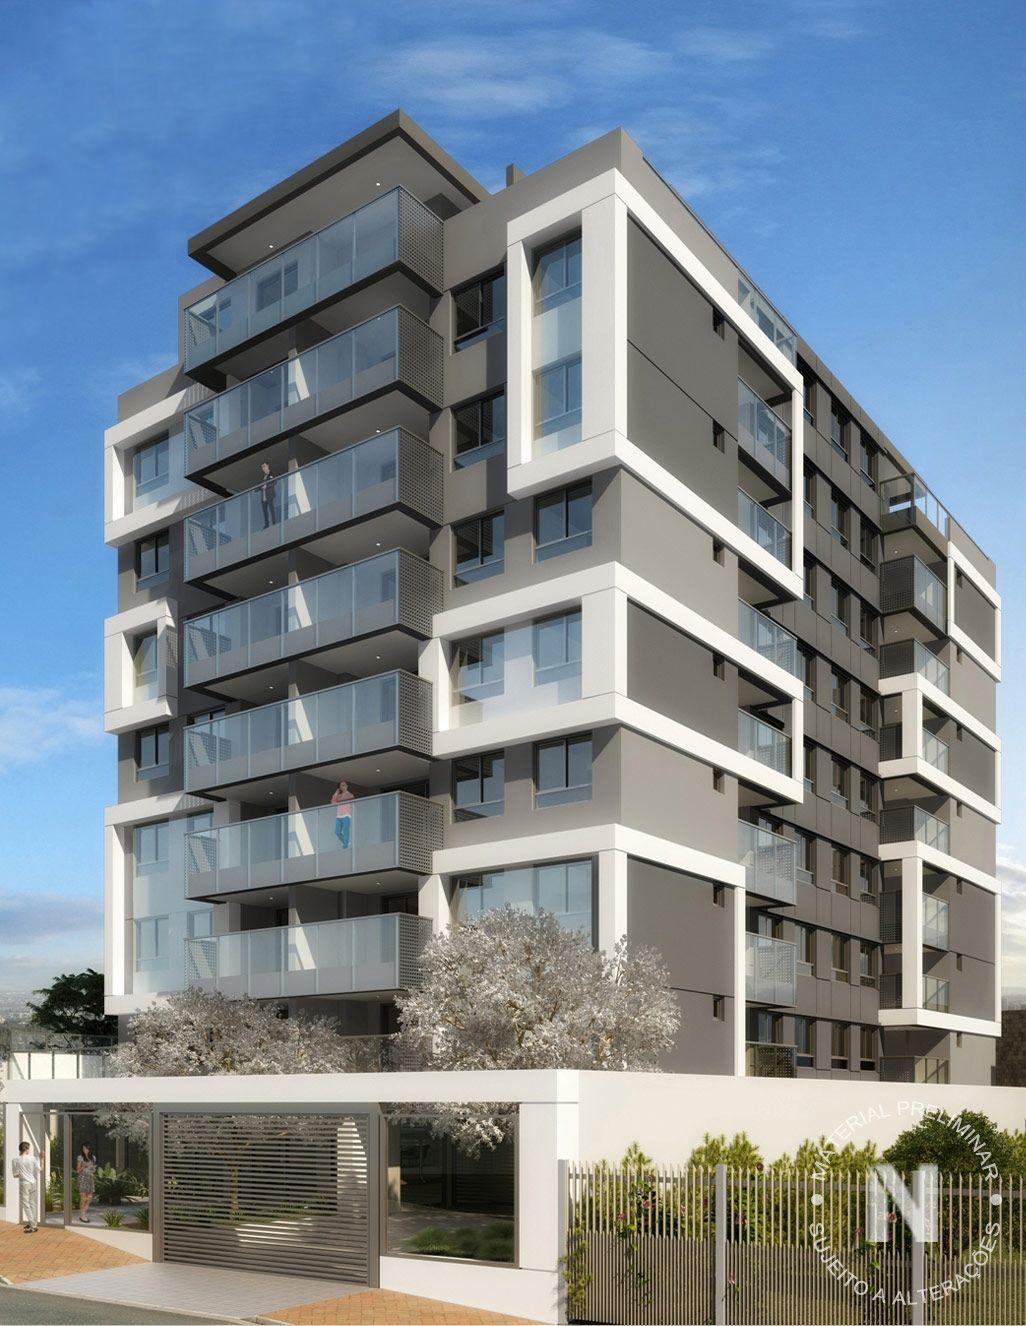 Vn jorge tibiri apartamento na vila mariana vitacon for Fachadas apartamentos modernos